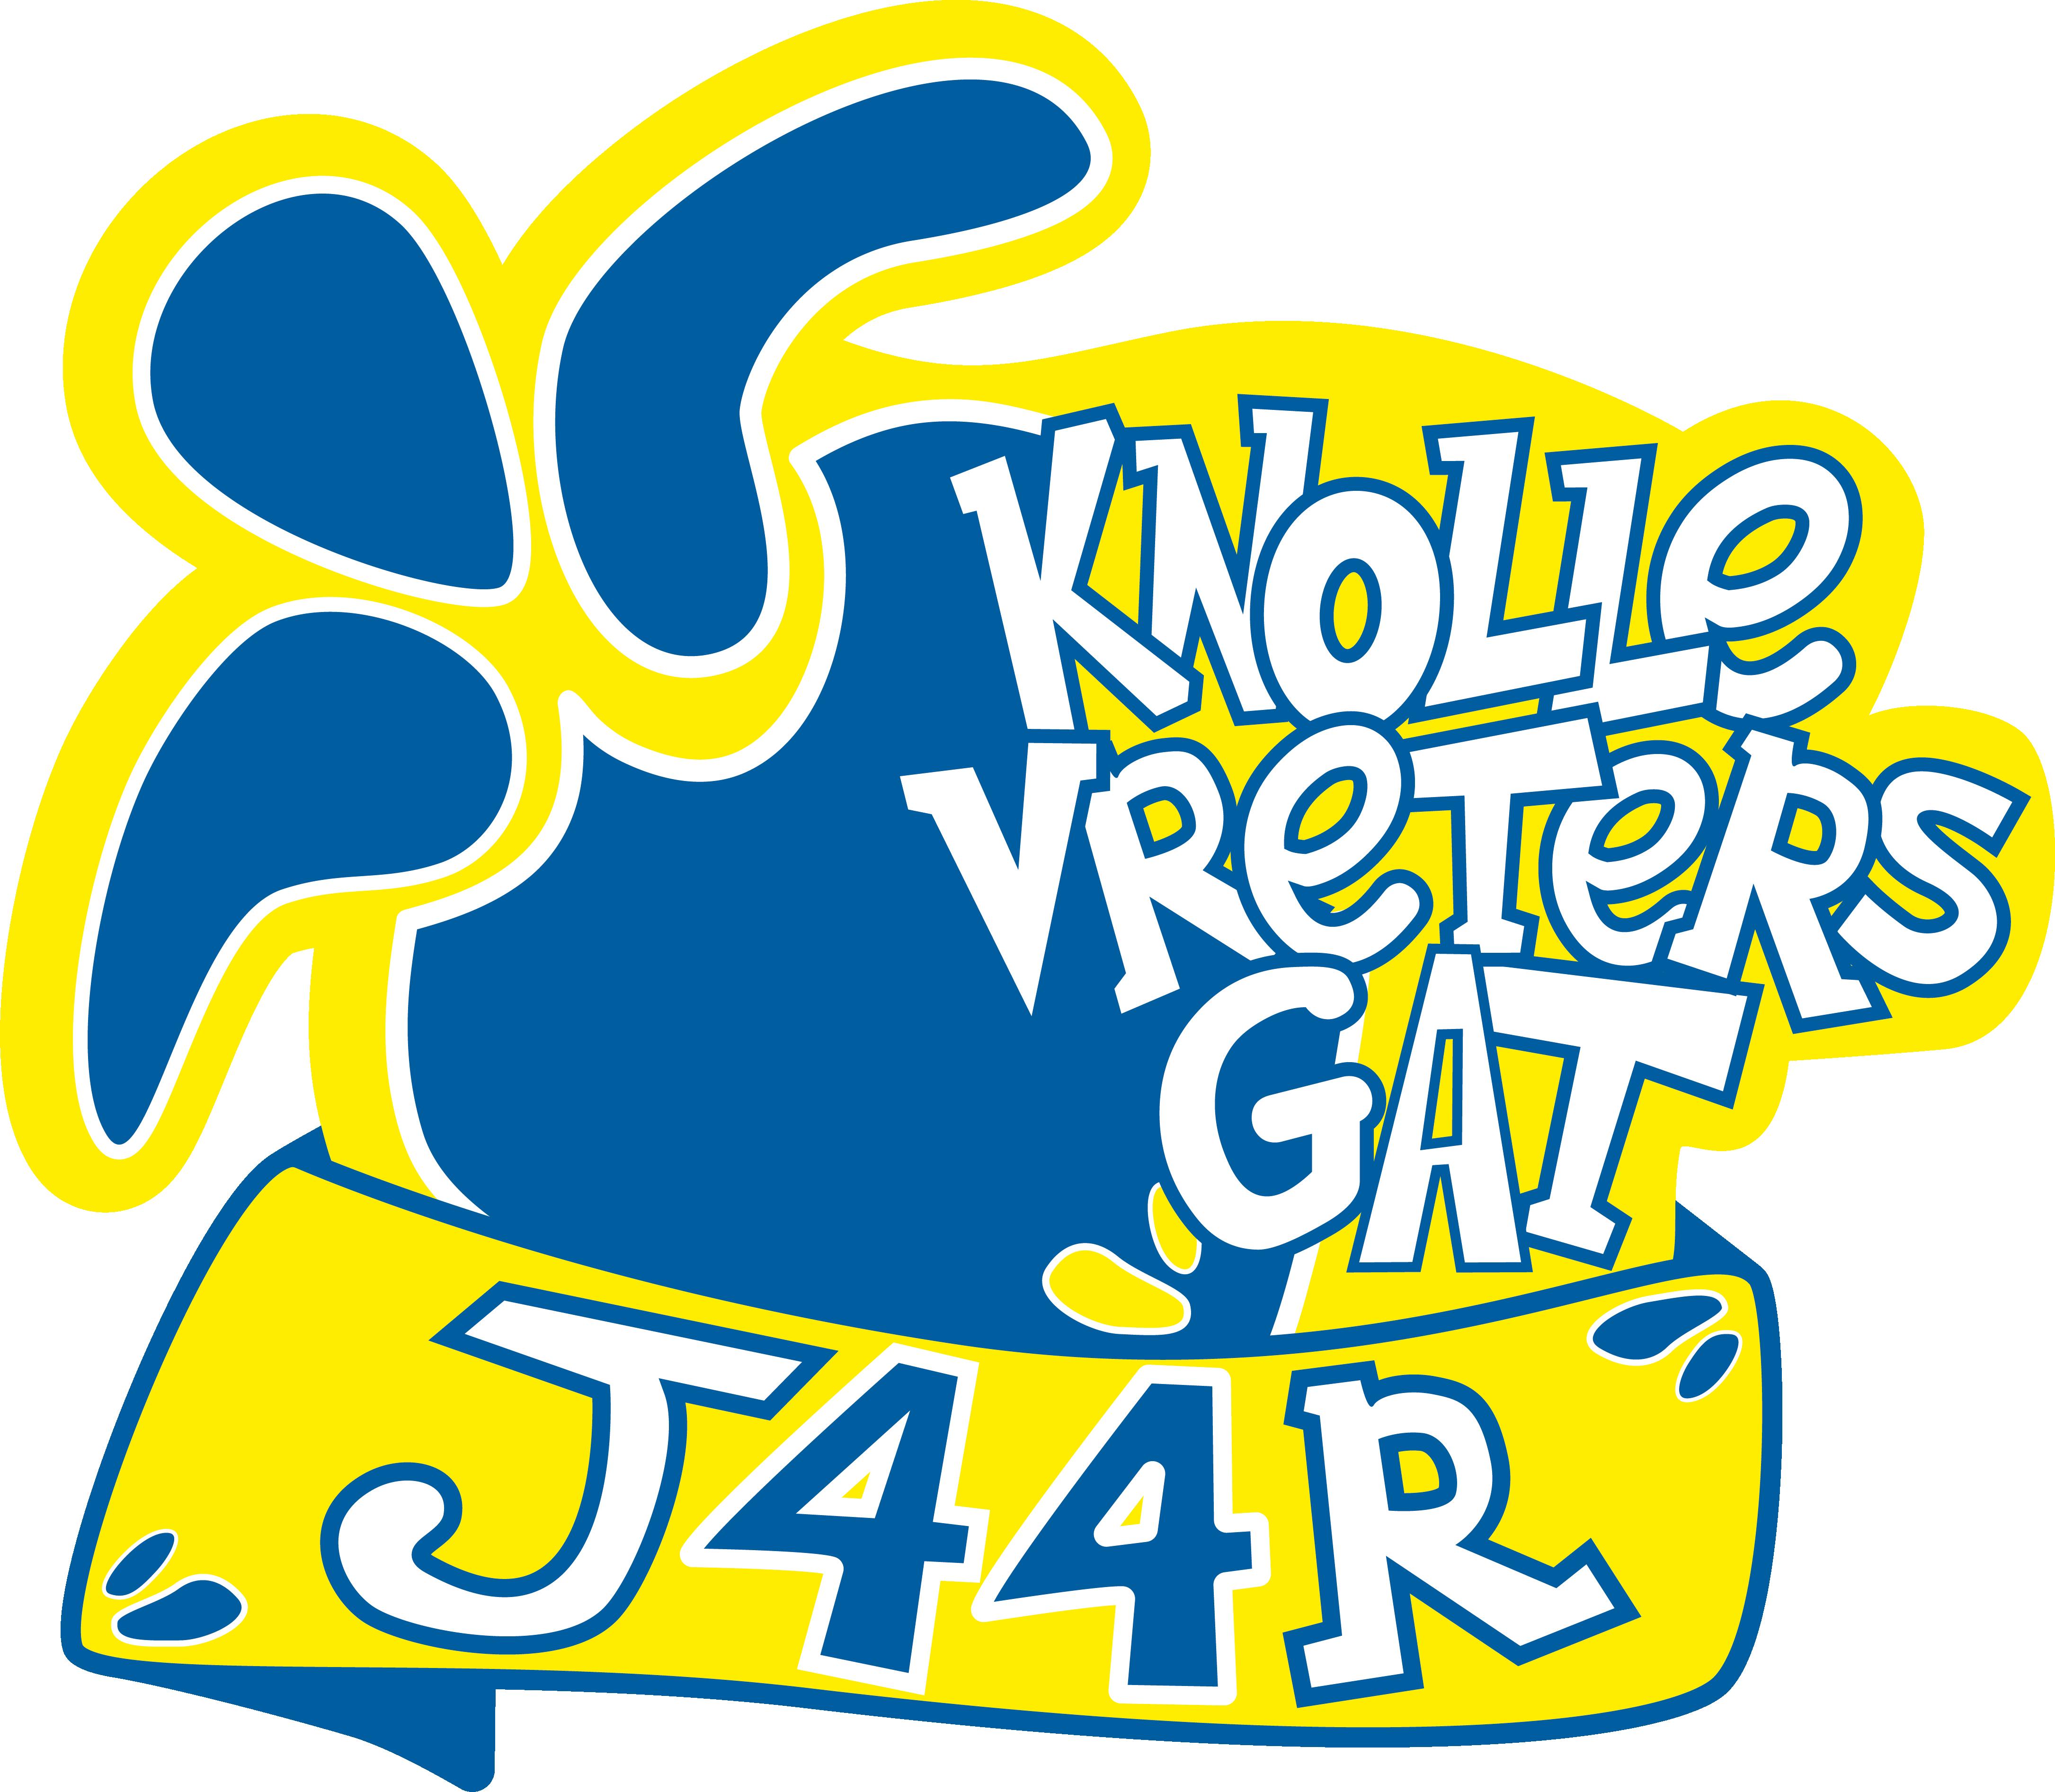 Logo_SOK_ 44 JAAR_DEF